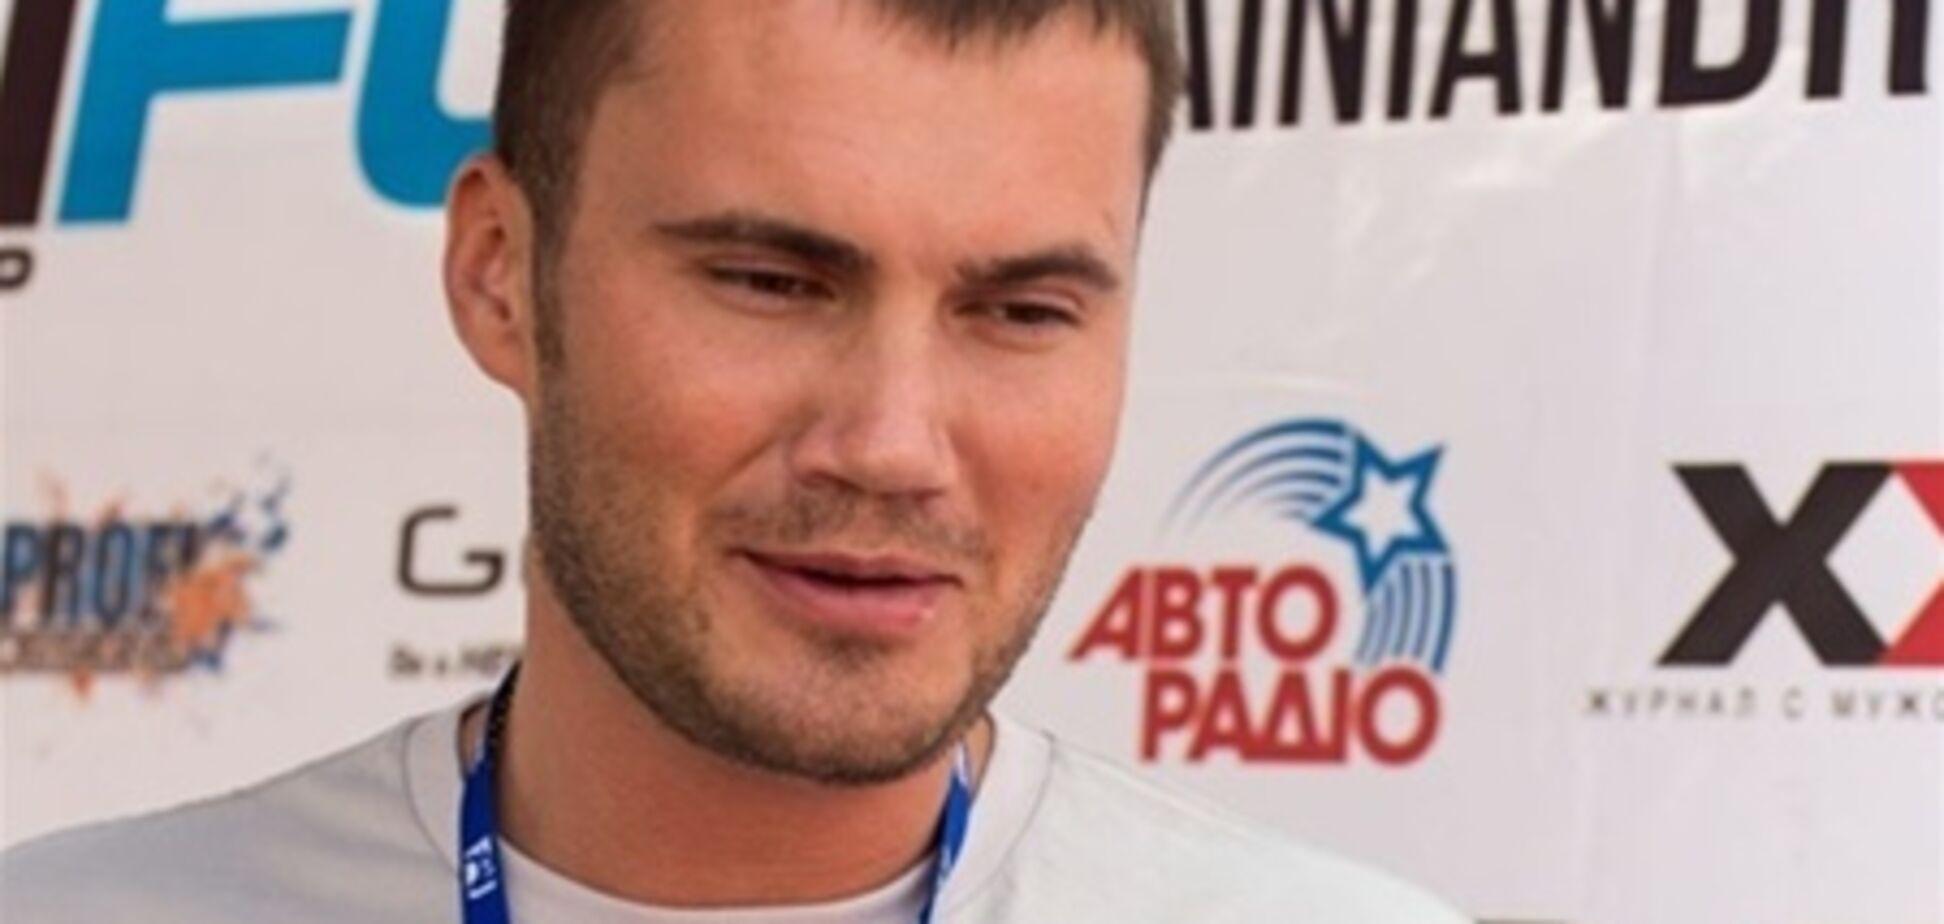 Виктор Янукович: я мечтаю стать дрифтером! Видео